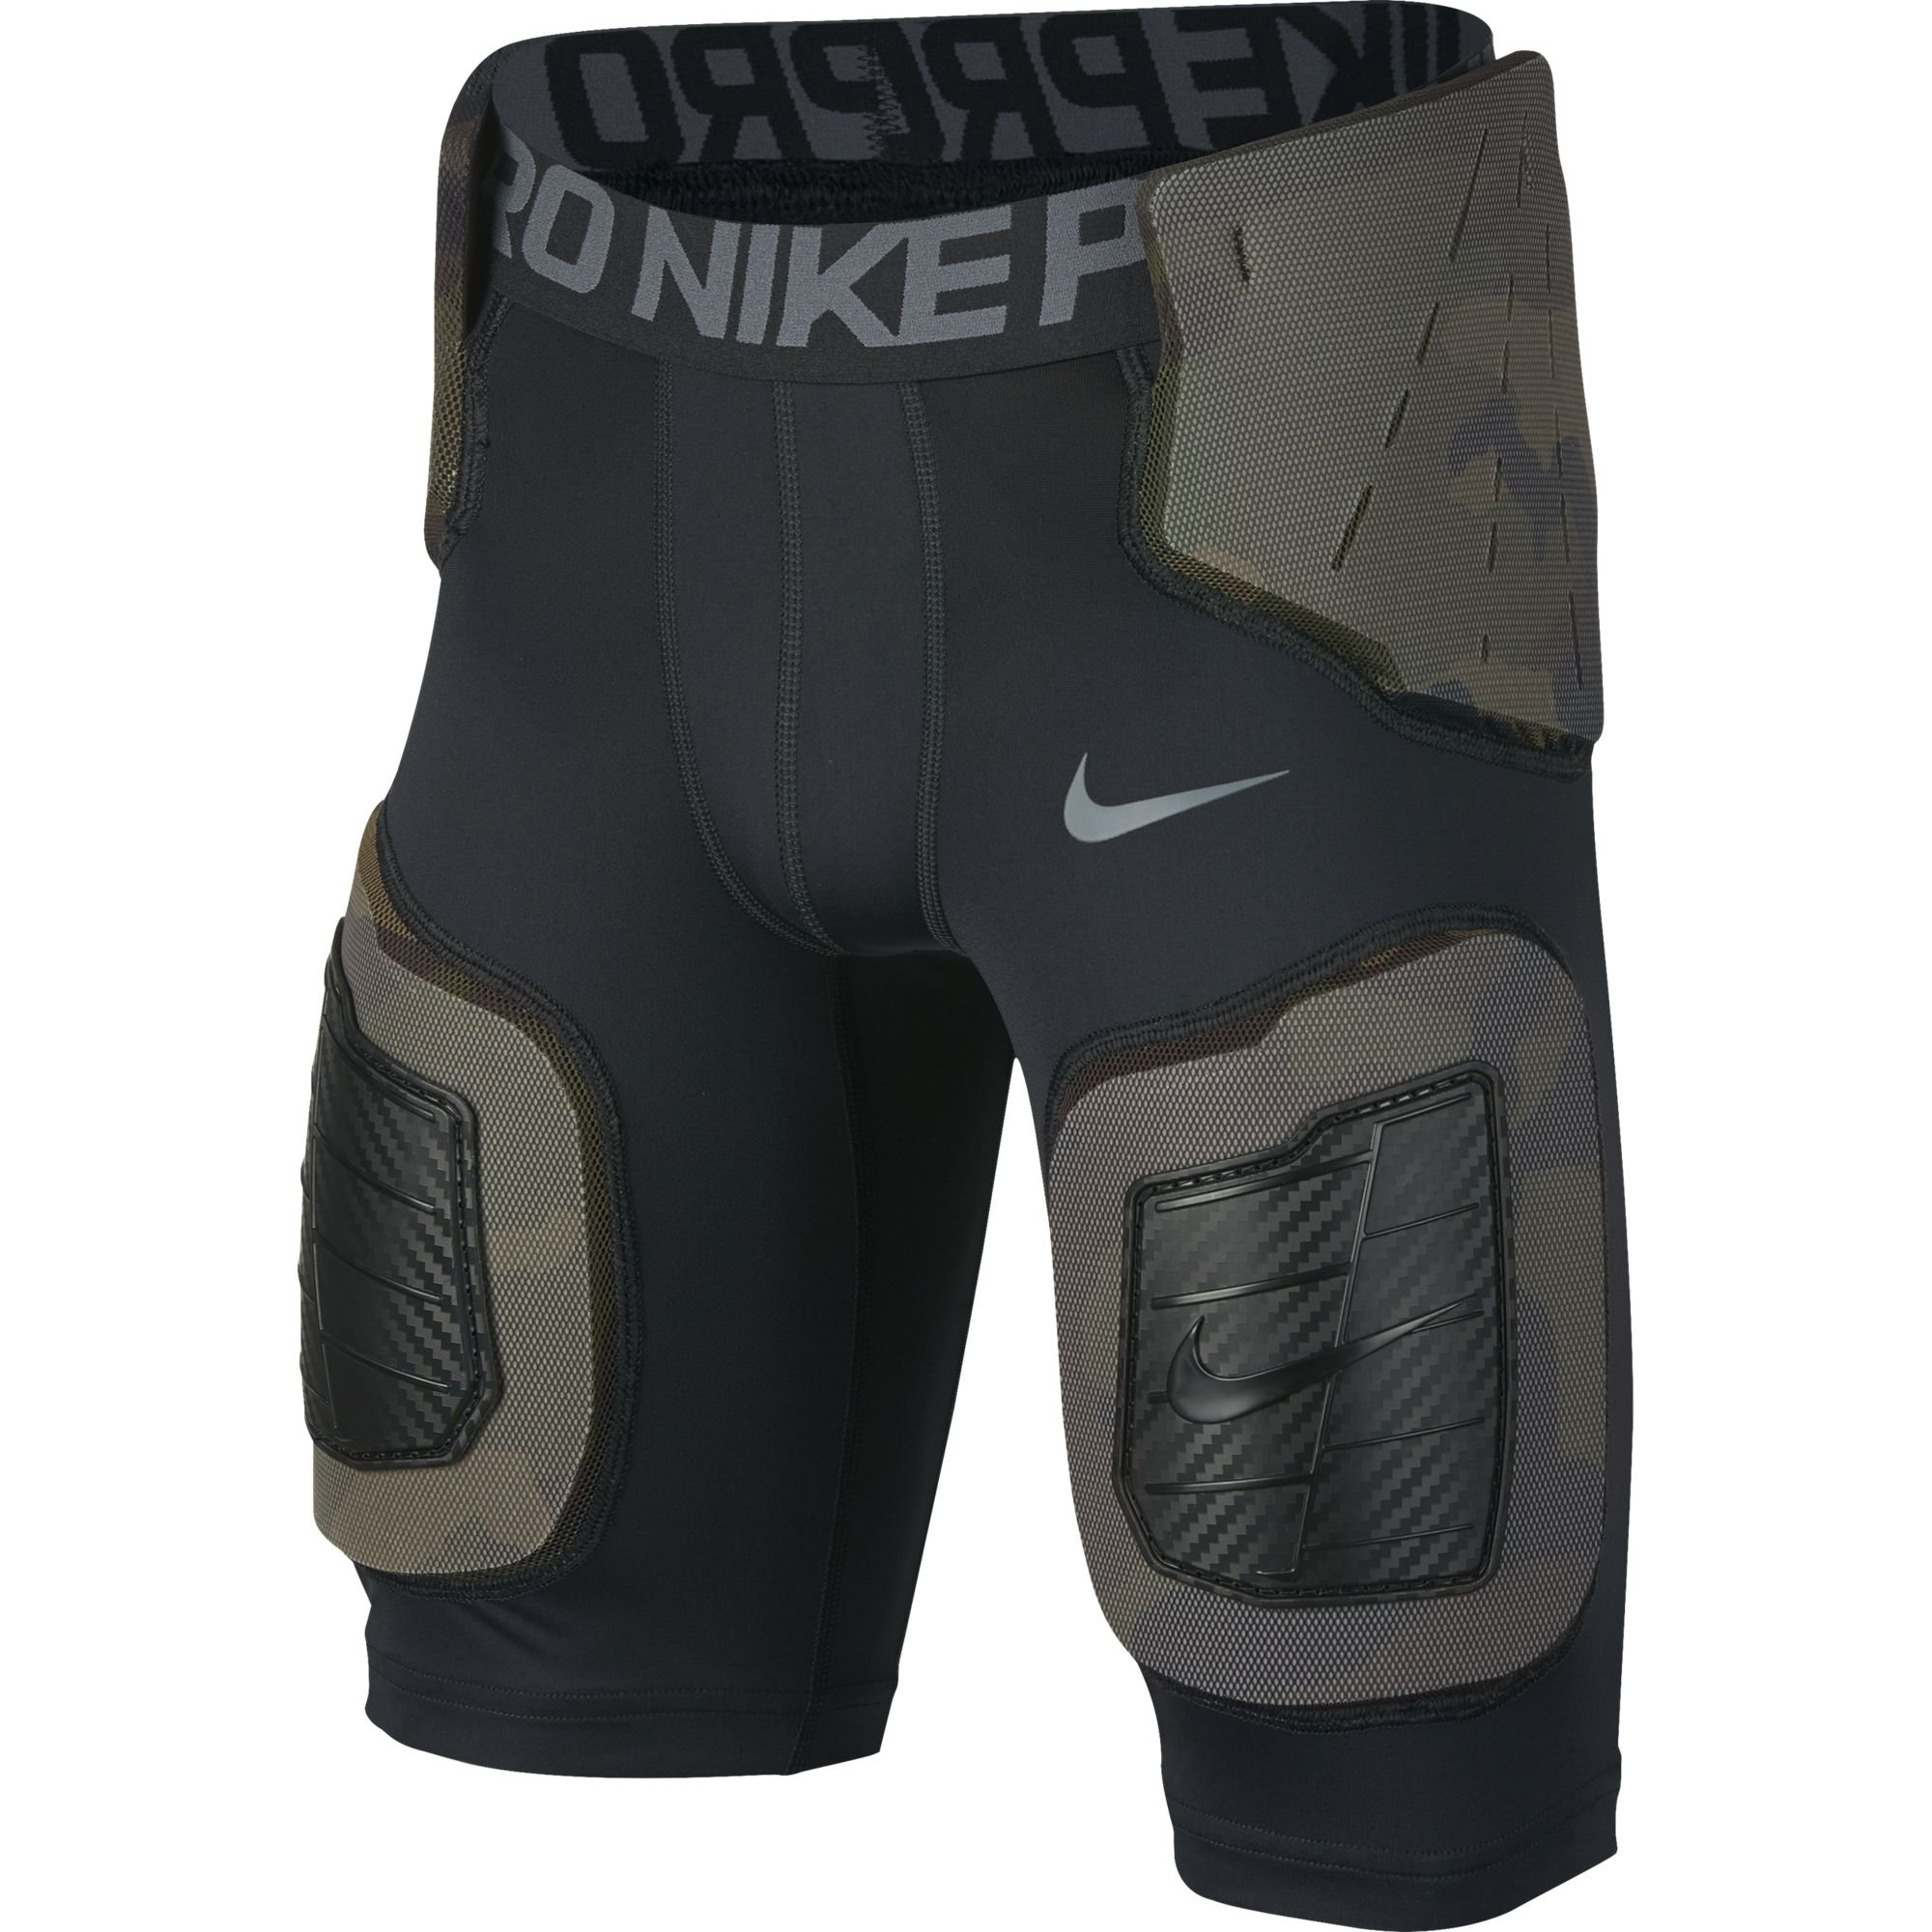 Boy's Nike Pro Hyperstrong Core Football Shorts Black/Dark Grey/Flint Grey Size Small